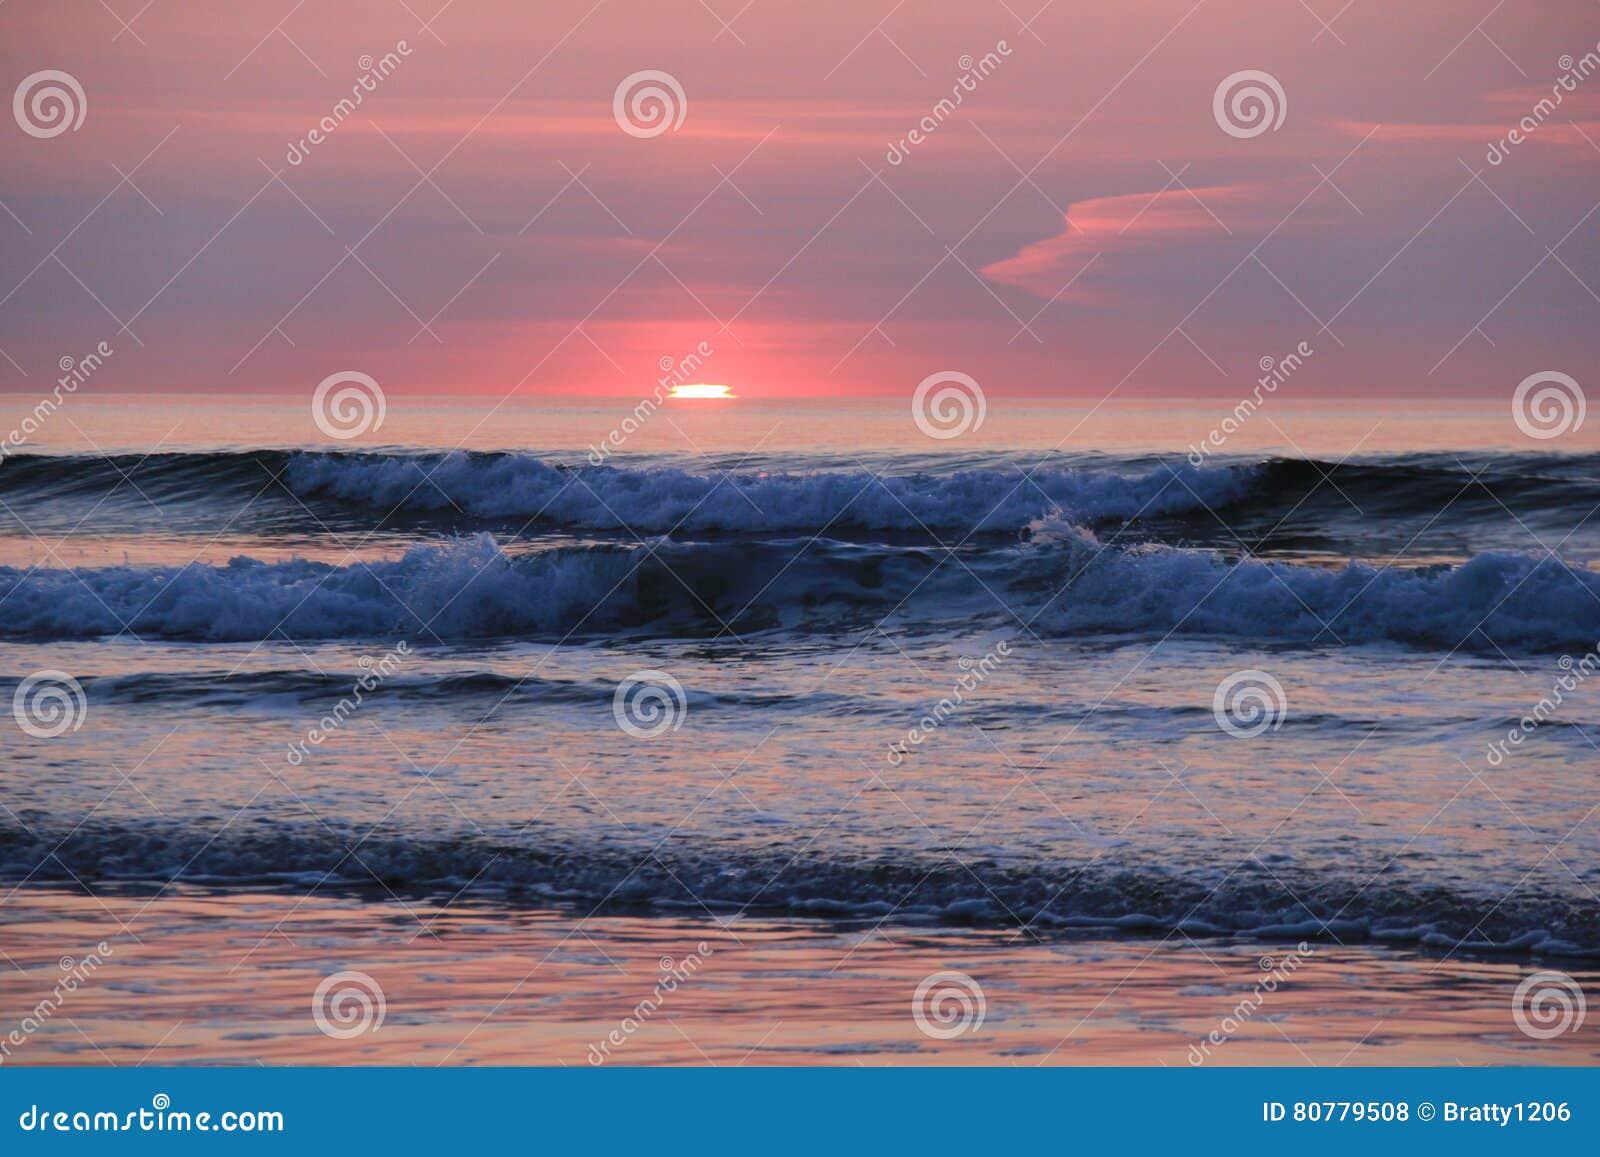 Lever de soleil magnifique au-dessus de l horizon de bord de la mer